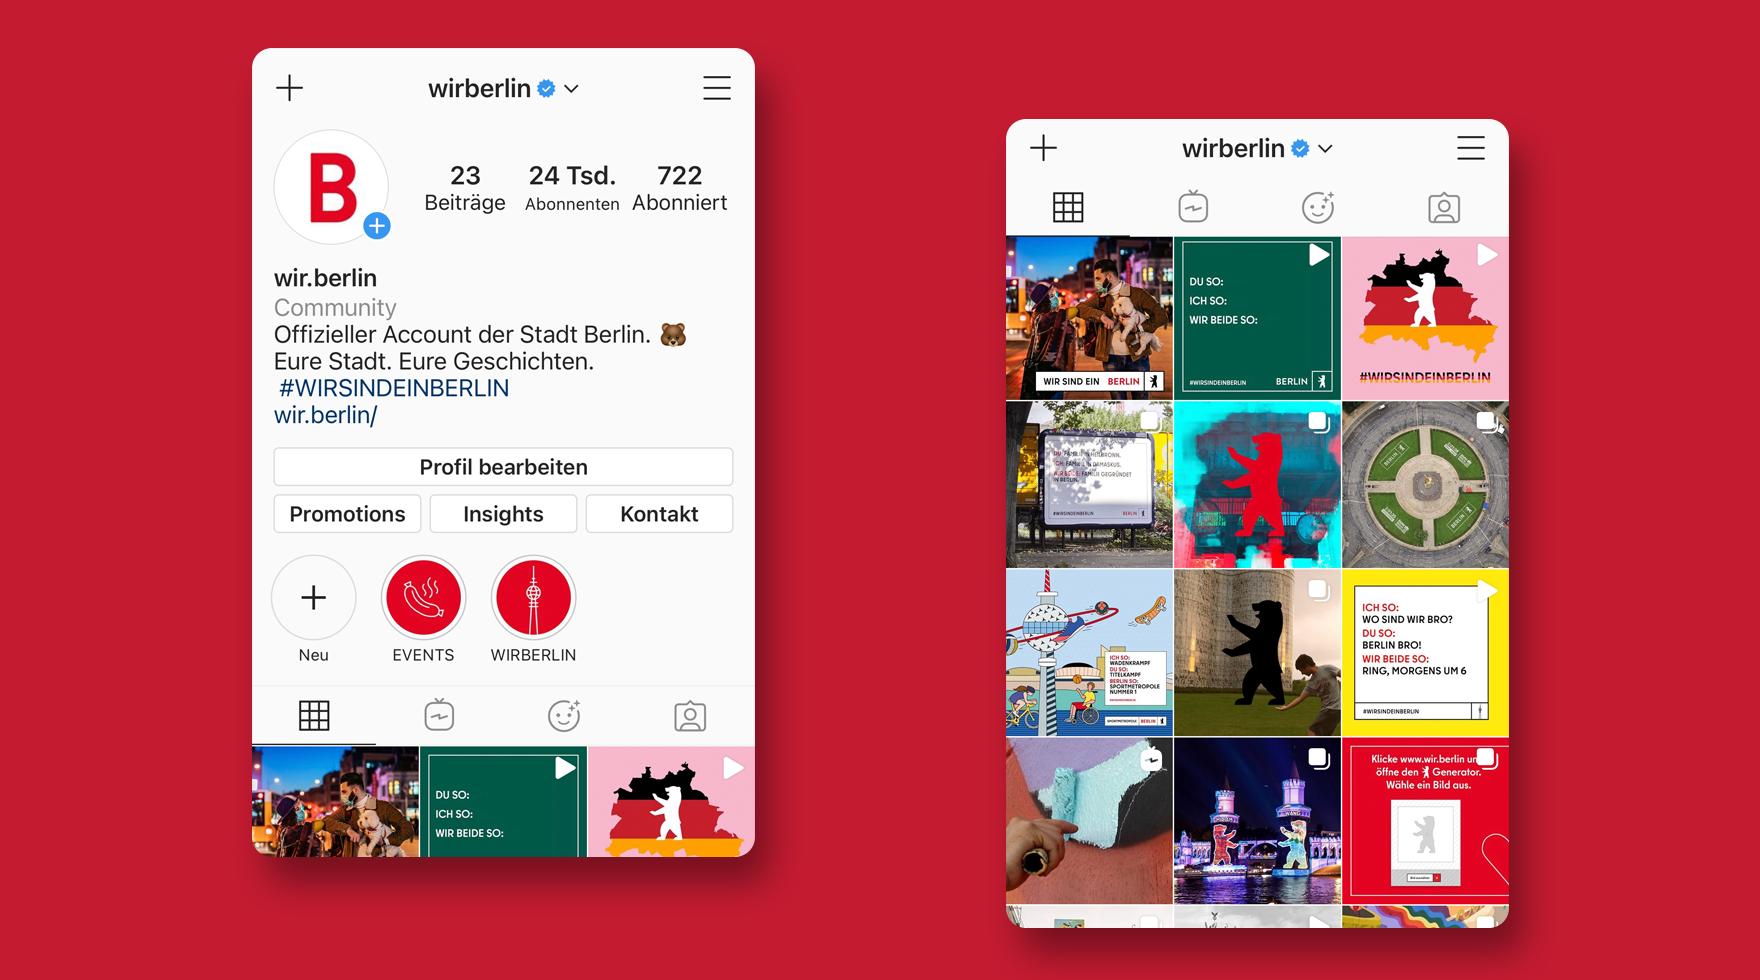 instagram-agentur-wir-berlin-webkreation